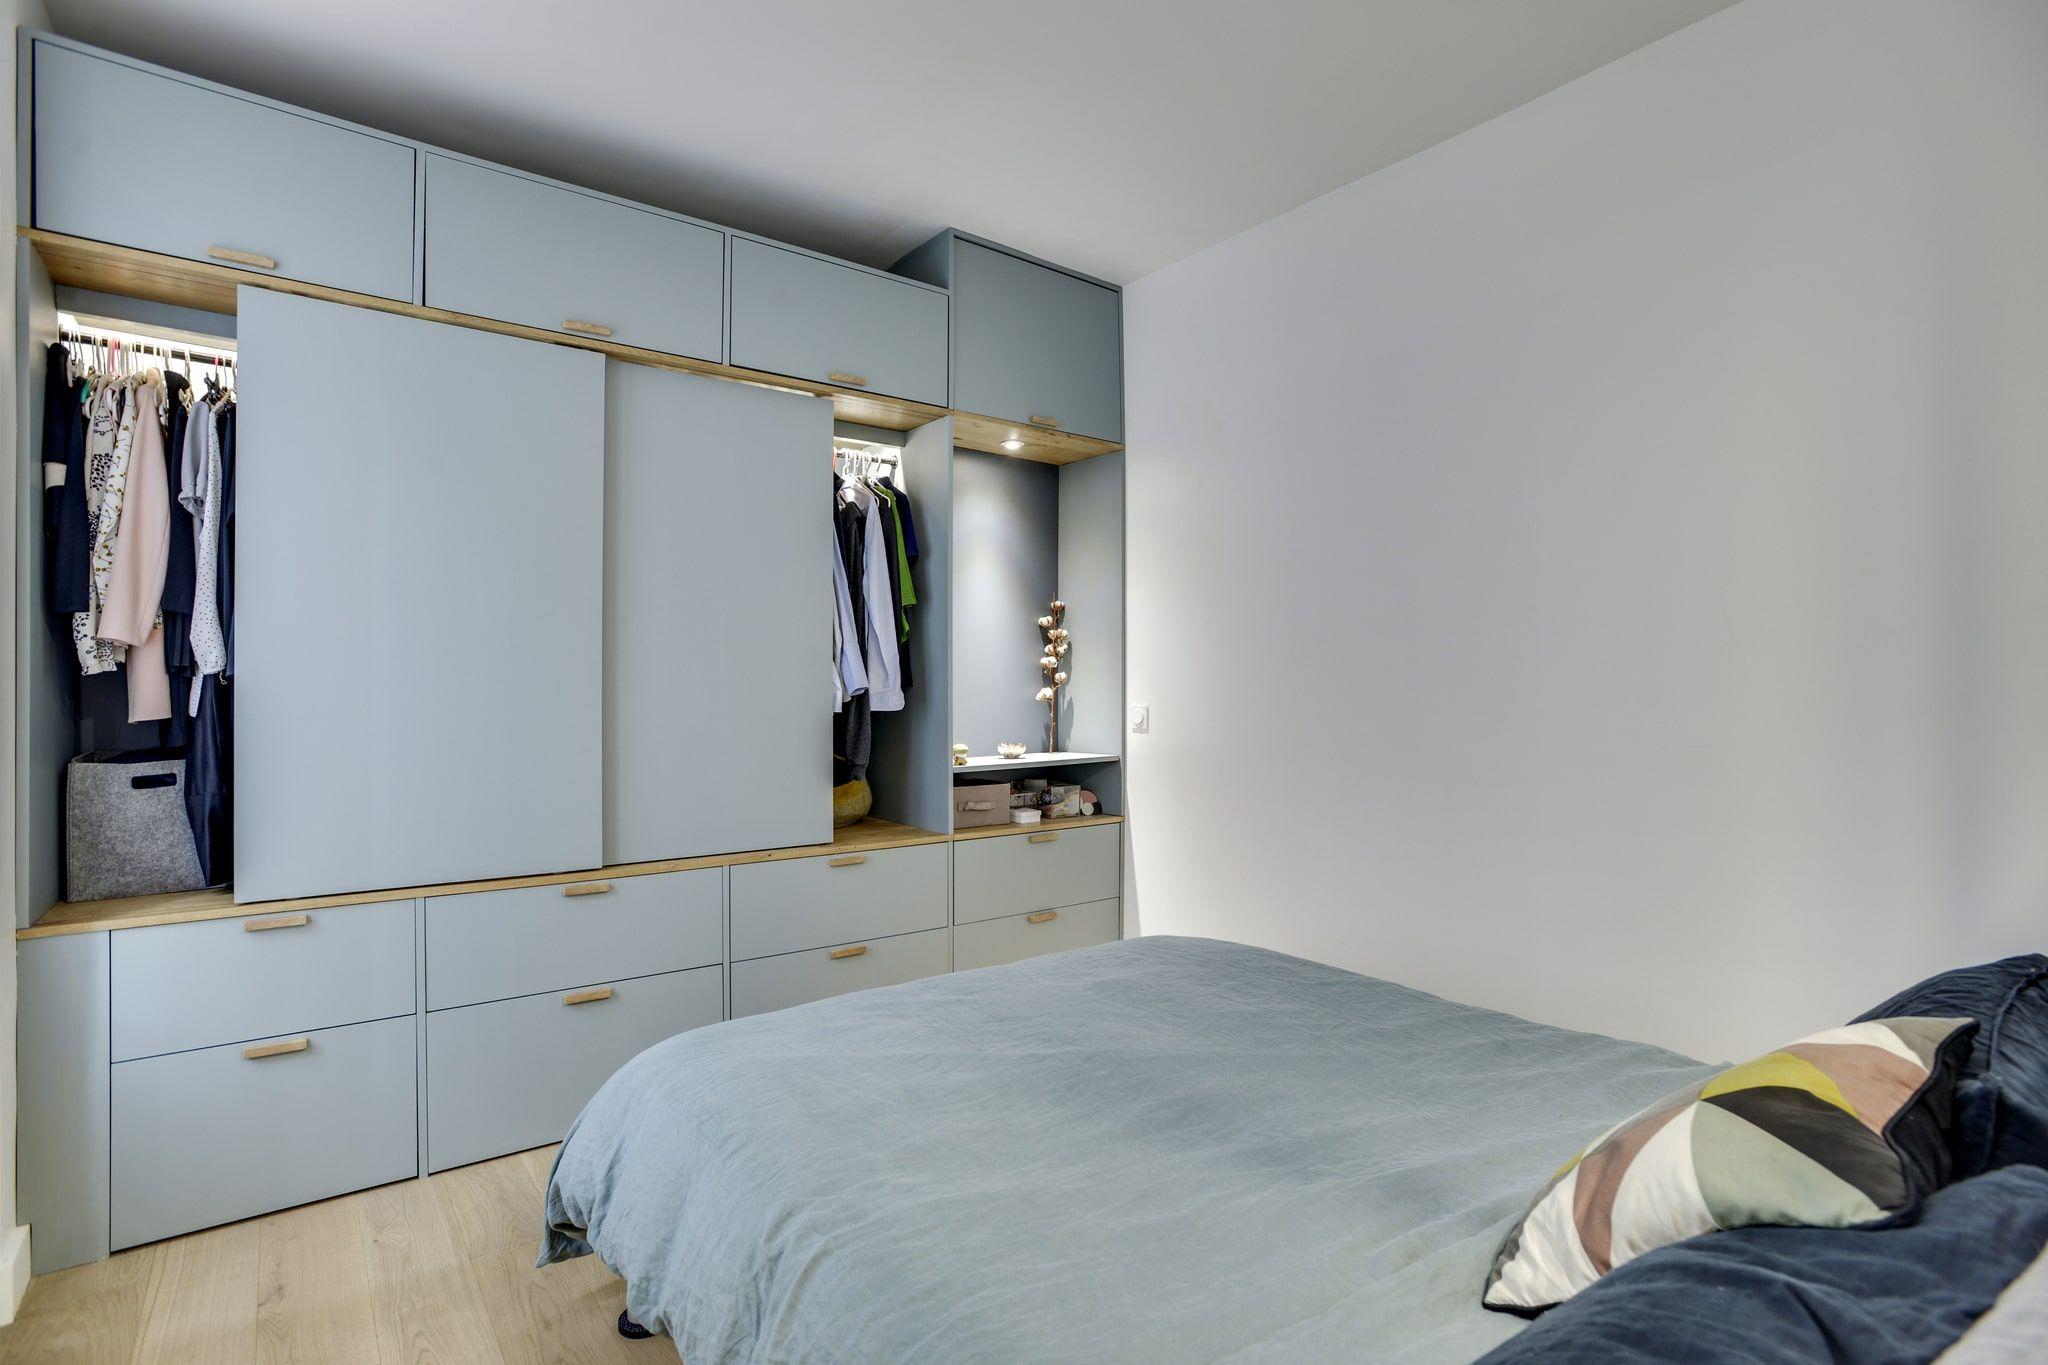 Chambre Avec Dressing En 2019 Chambre Salle De Bain Dressing